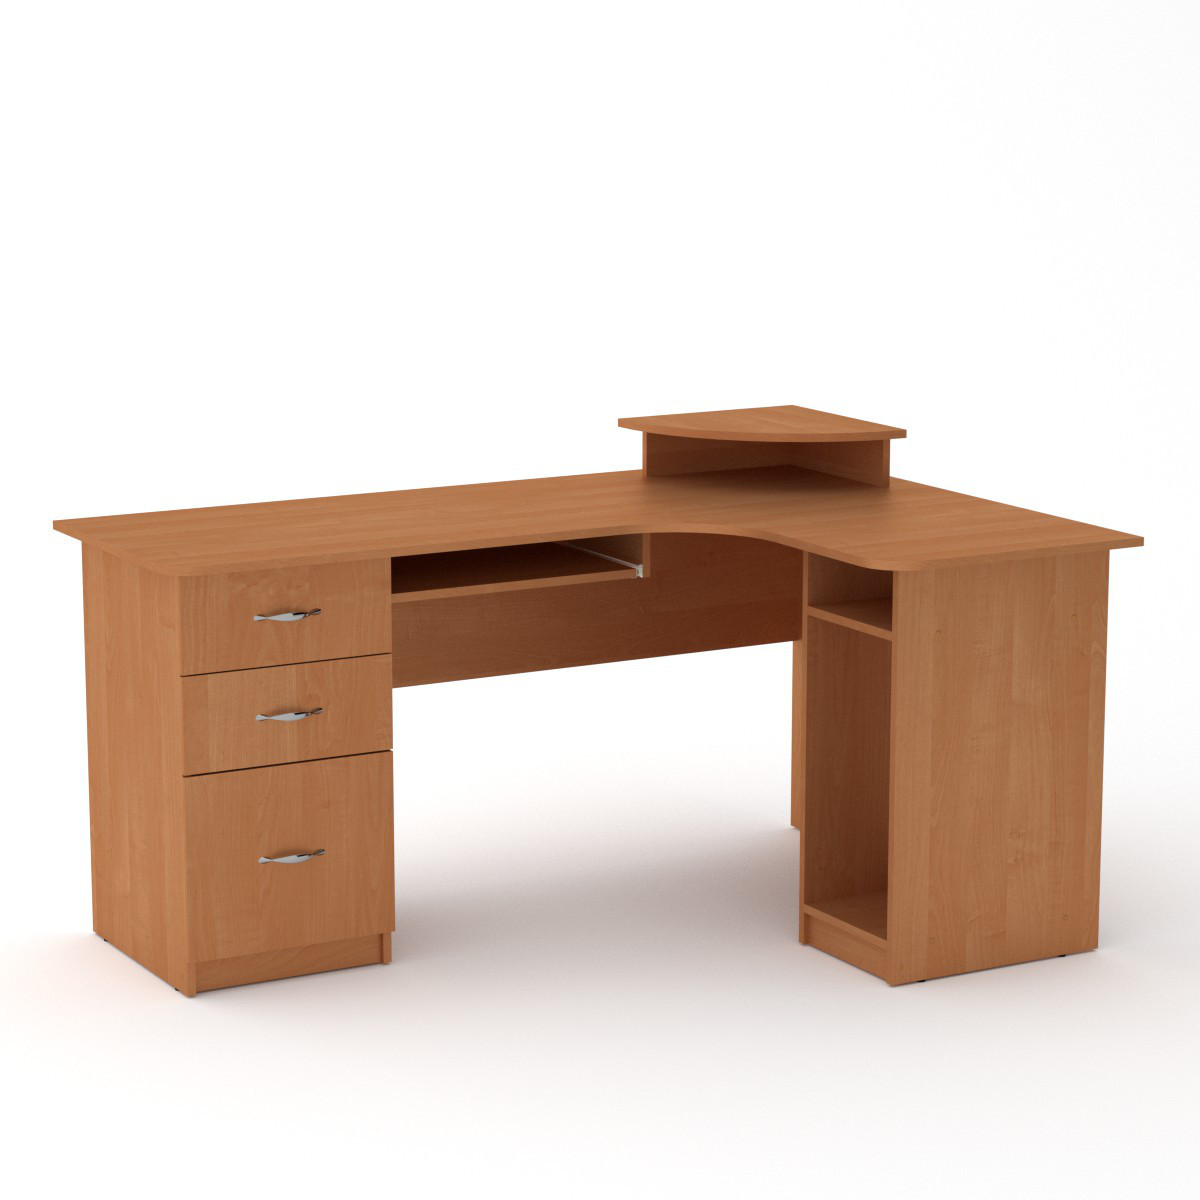 Стол компьютерный СУ-3 ольха Компанит (160х110х87 см)